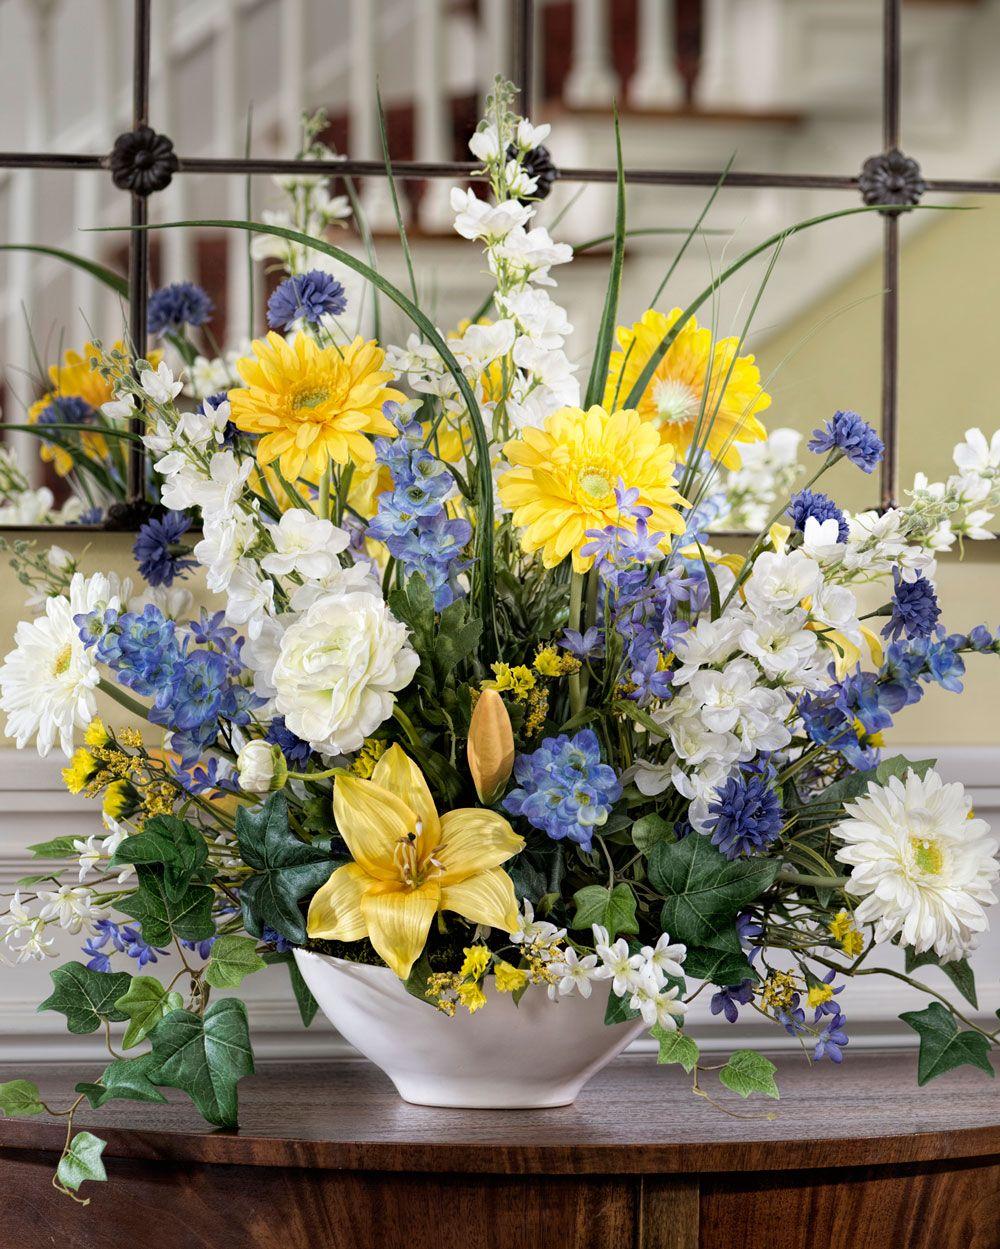 Delphinium Daisy Lily Br Silk Flower Arrangement Yellow Flower Arrangements Flower Arrangements Flower Centerpieces